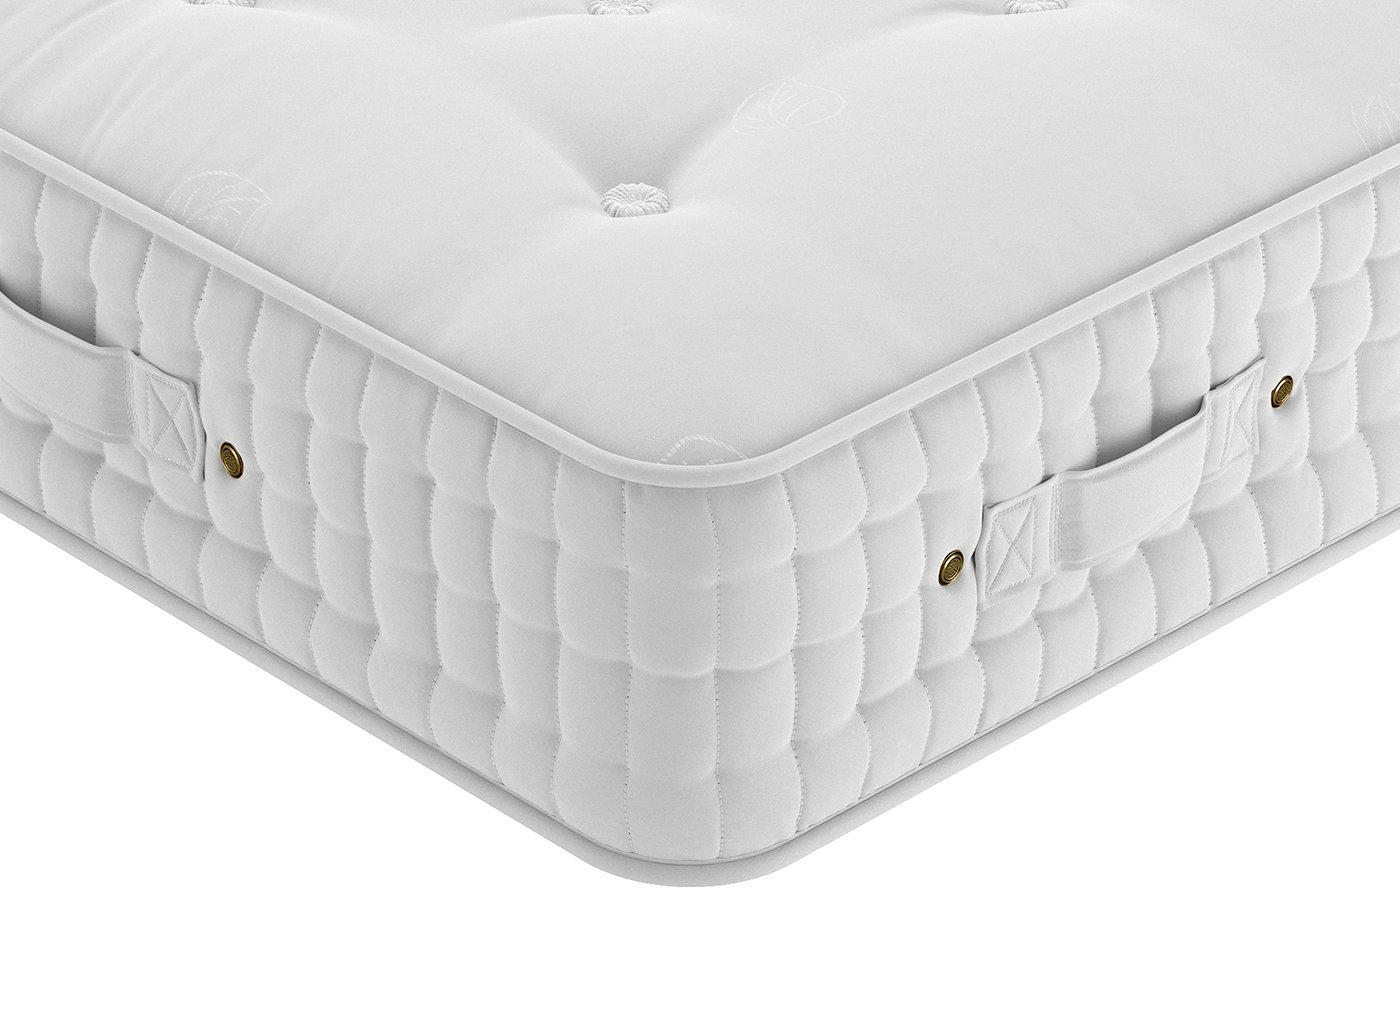 Flaxby Nature's Finest 13,400 K Mattress Soft Zipped 5'0 King